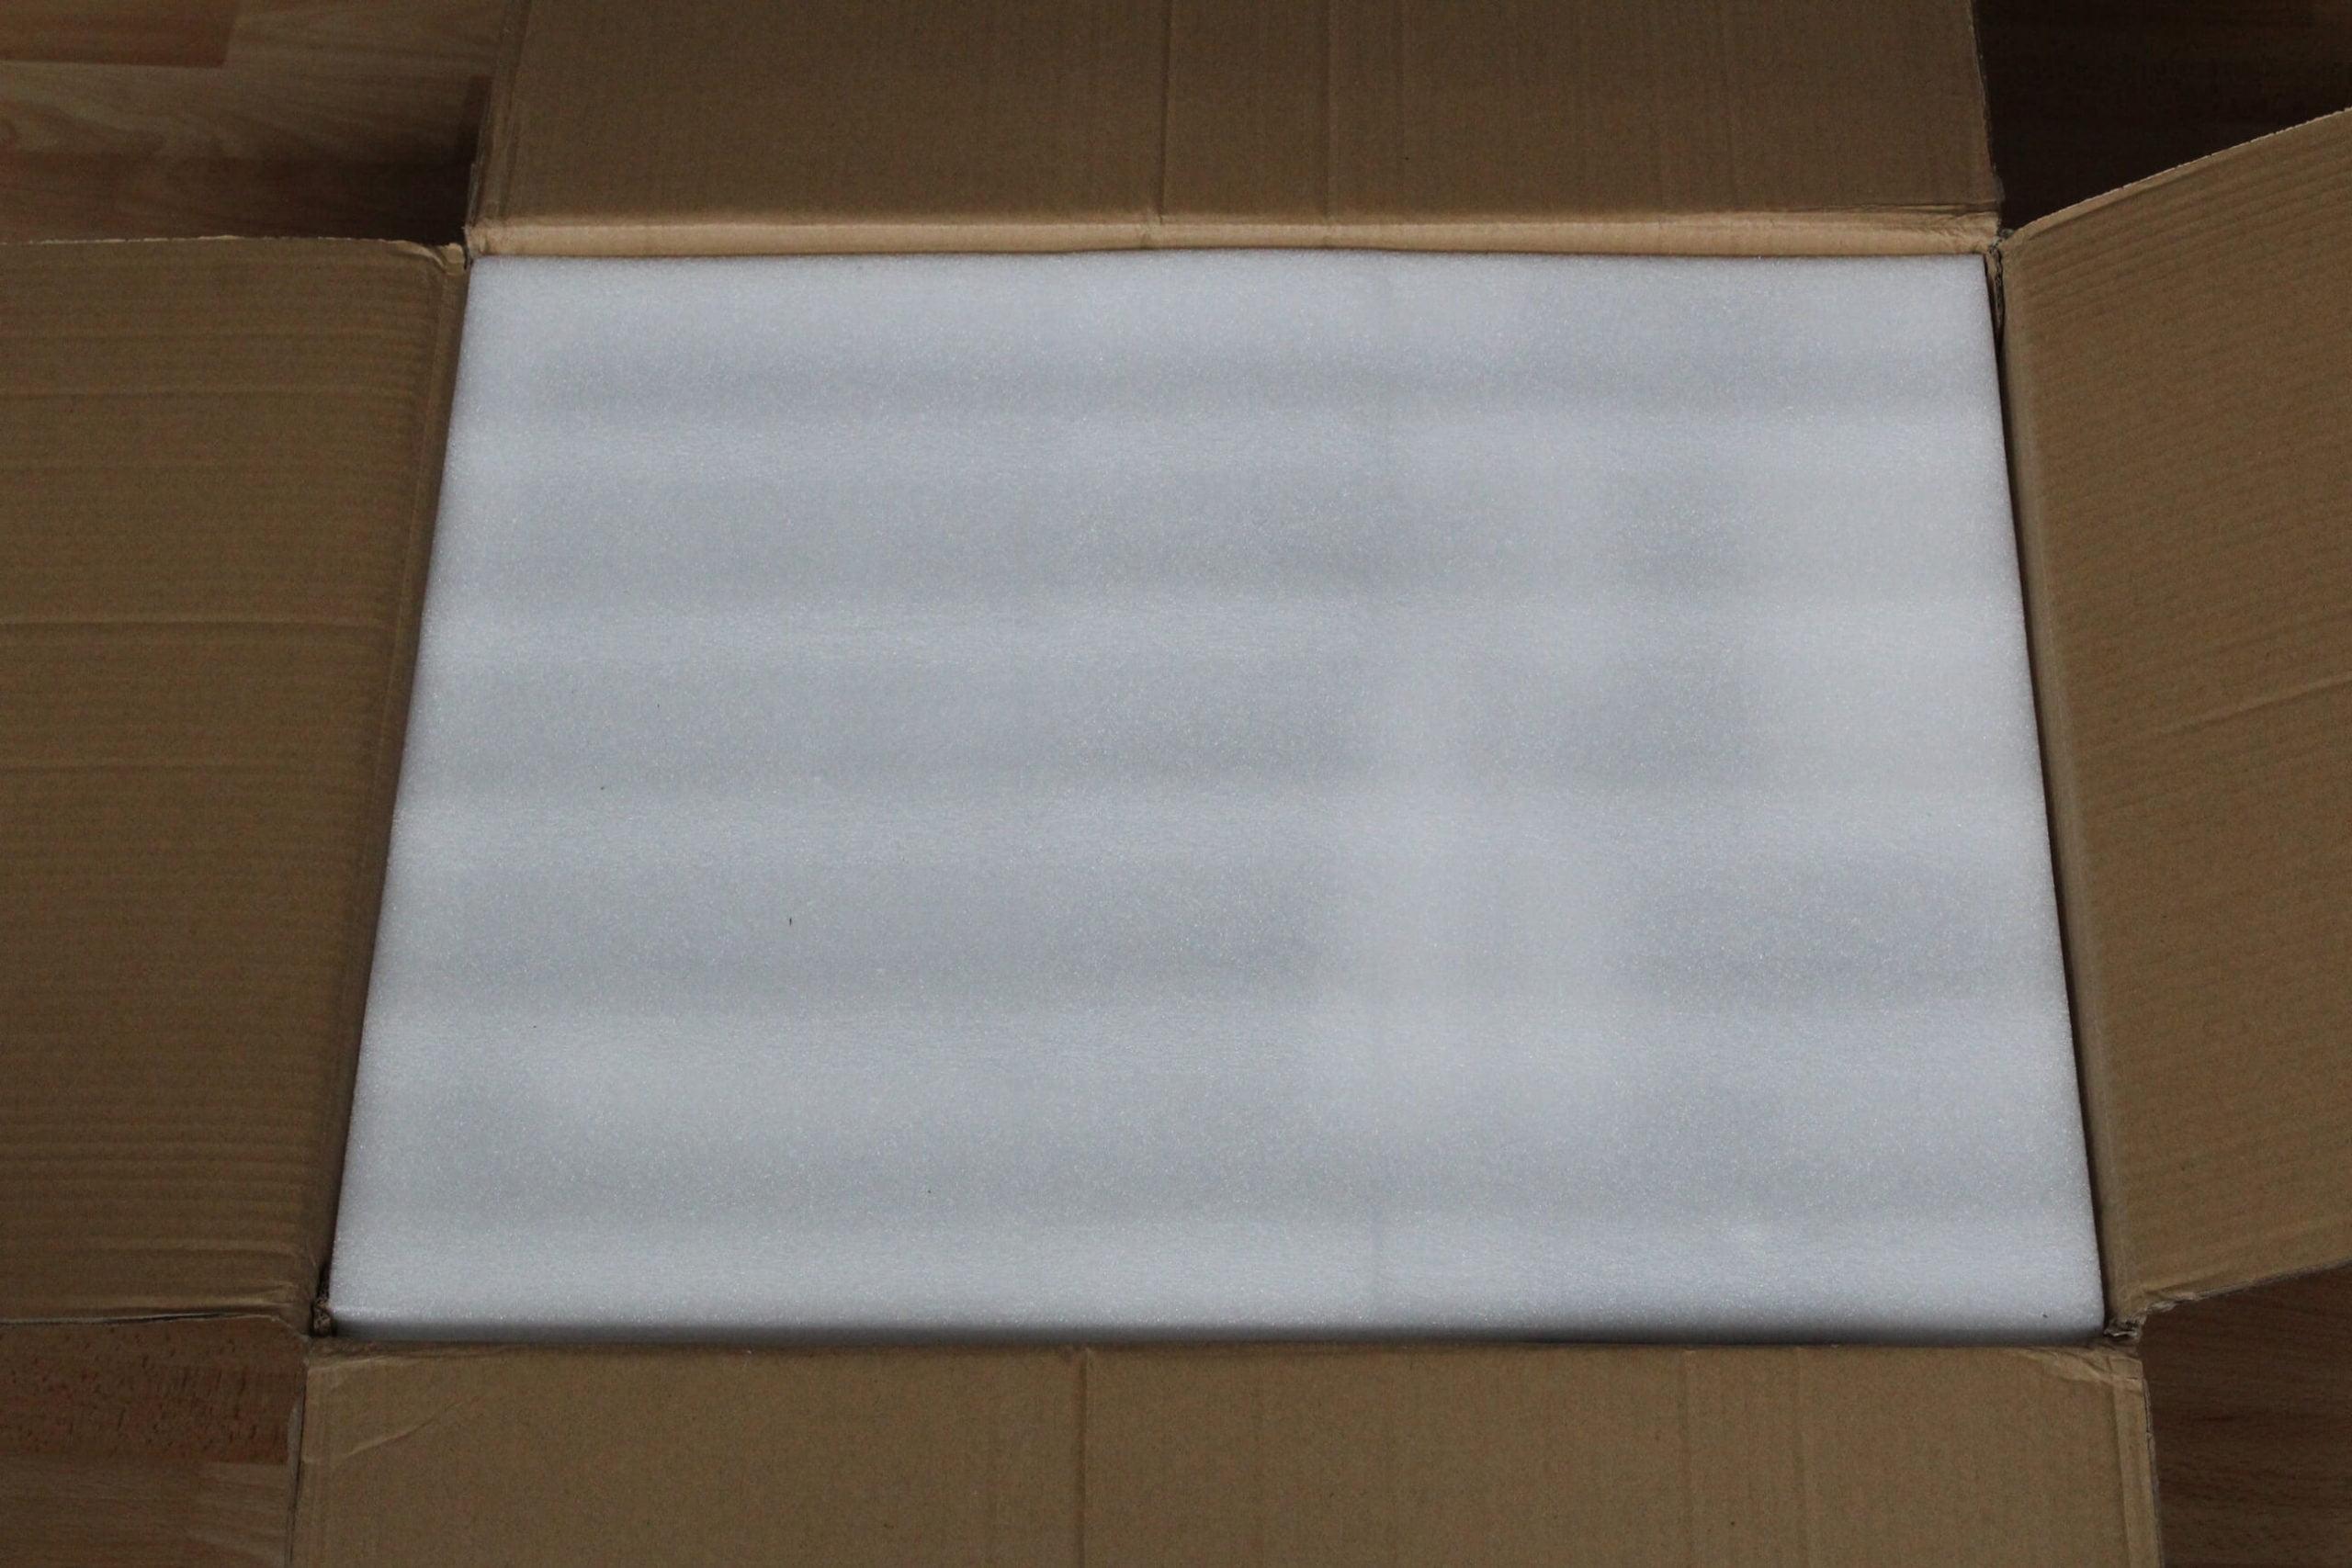 Mingda-D3-Pro-Review-Packaging-1